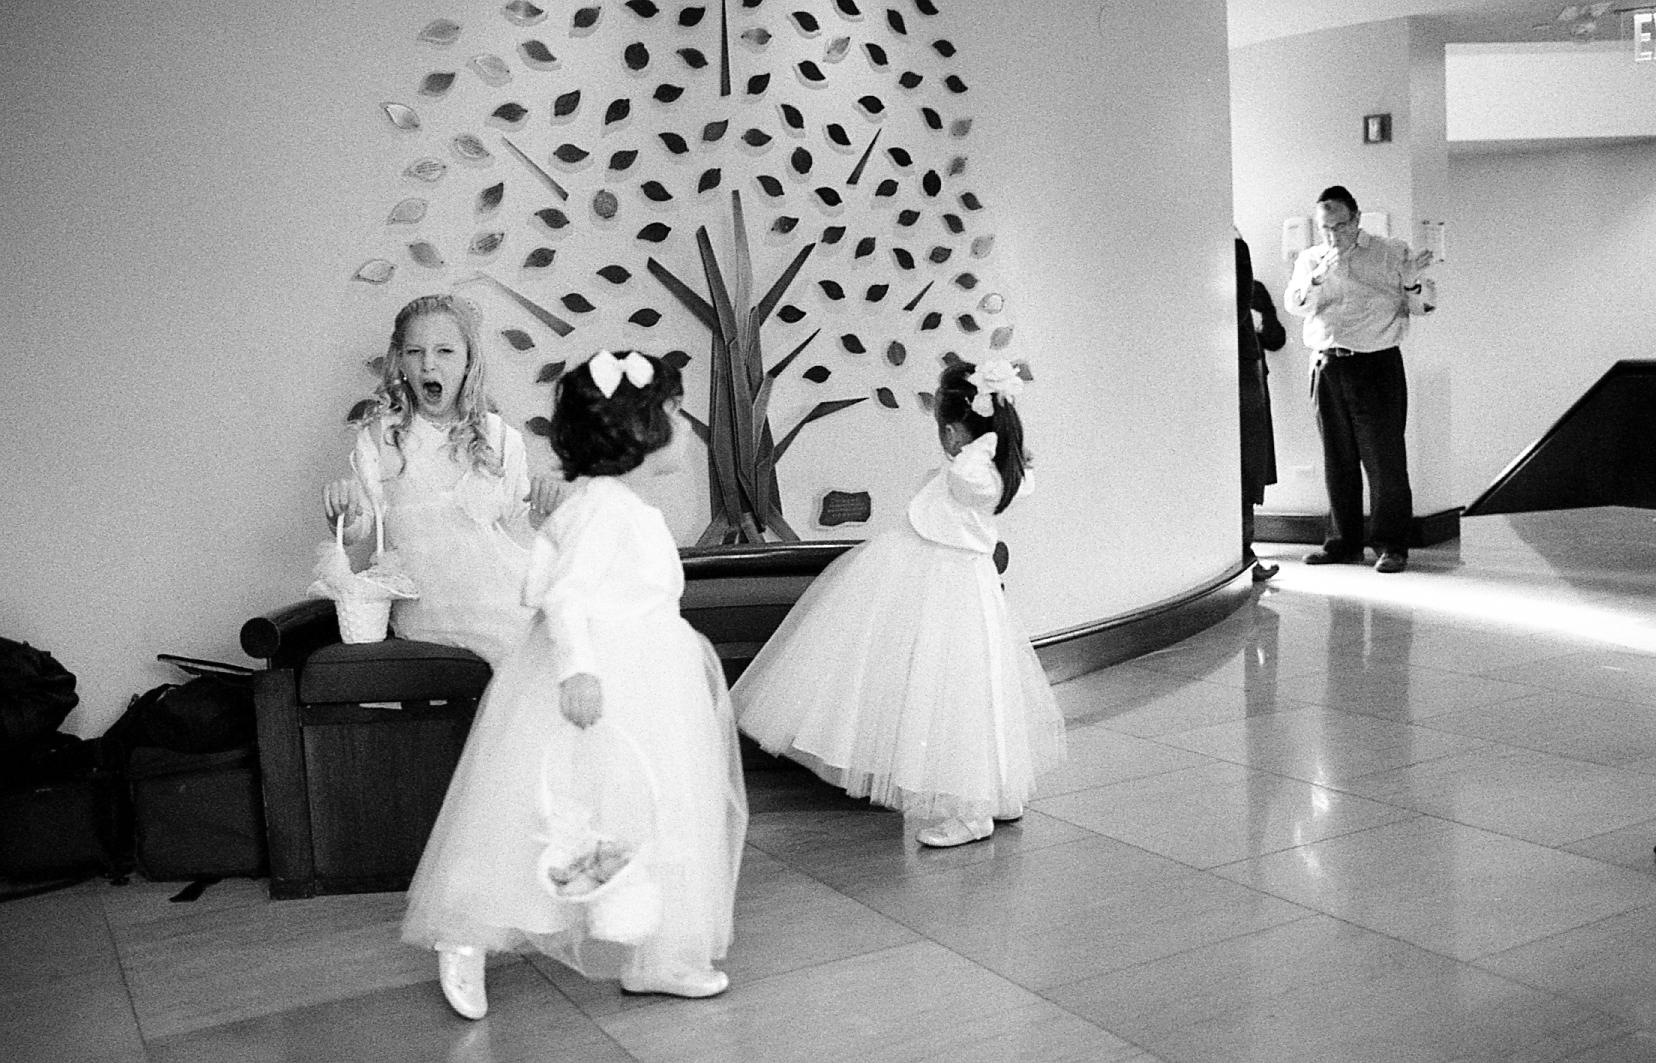 New-York-City-Hasidic-Jewish-Wedding-Manhattan-Beach-NYC-Photojournalistic-Wedding-Photography-Jacek-Dolata-35mm-medium-format-film-18.jpg